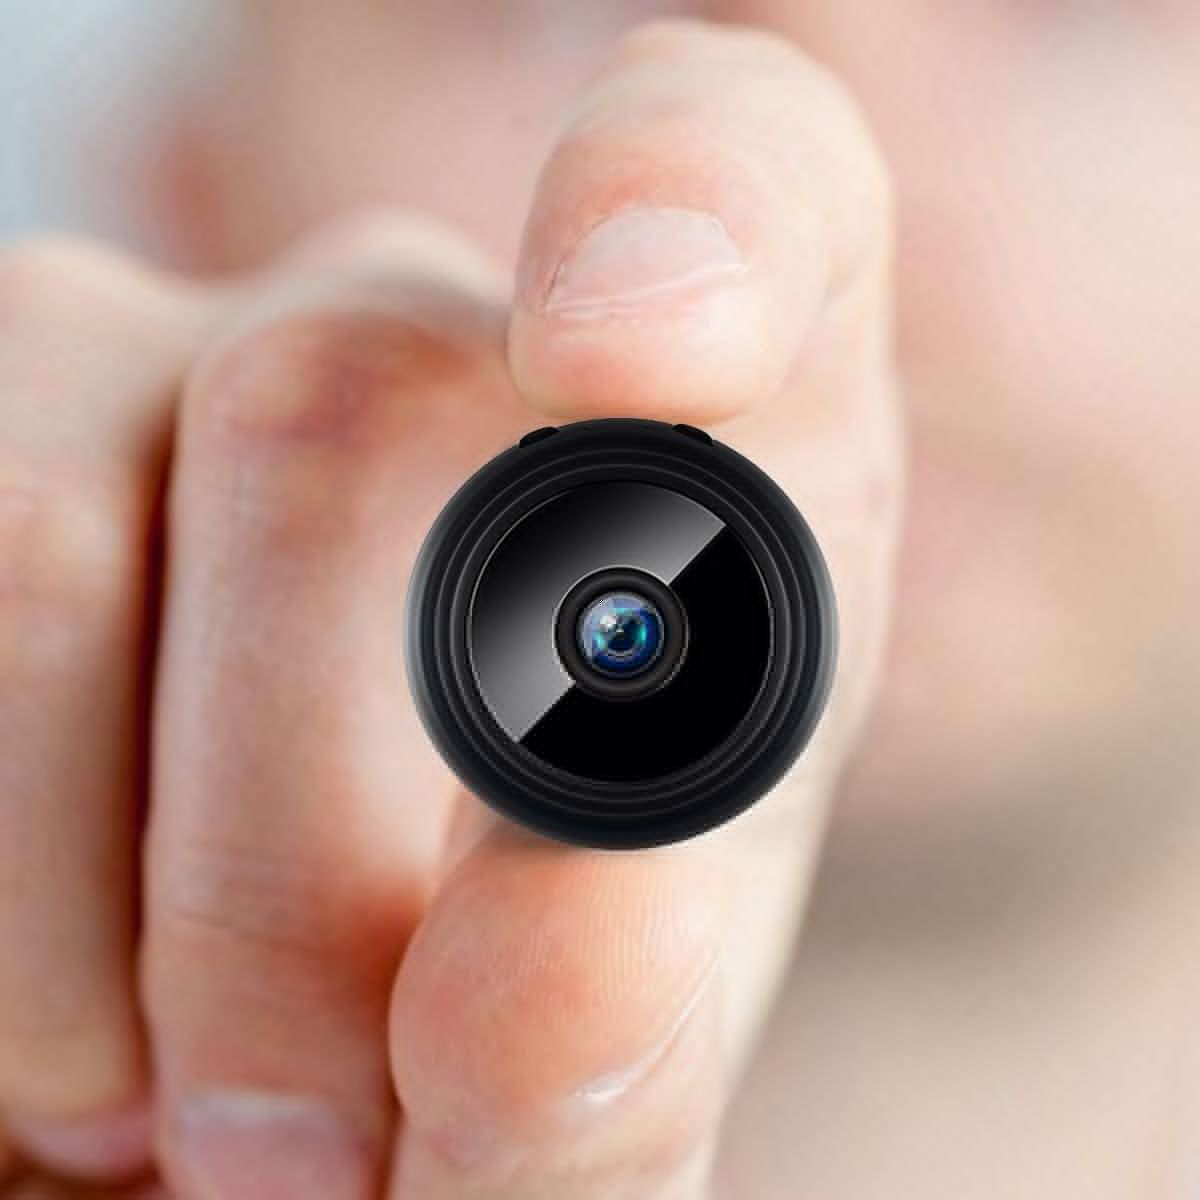 1x 1080P HD Mini Hidden Spy Camera Camcorder DVR Video Recorder Cam Night Vision